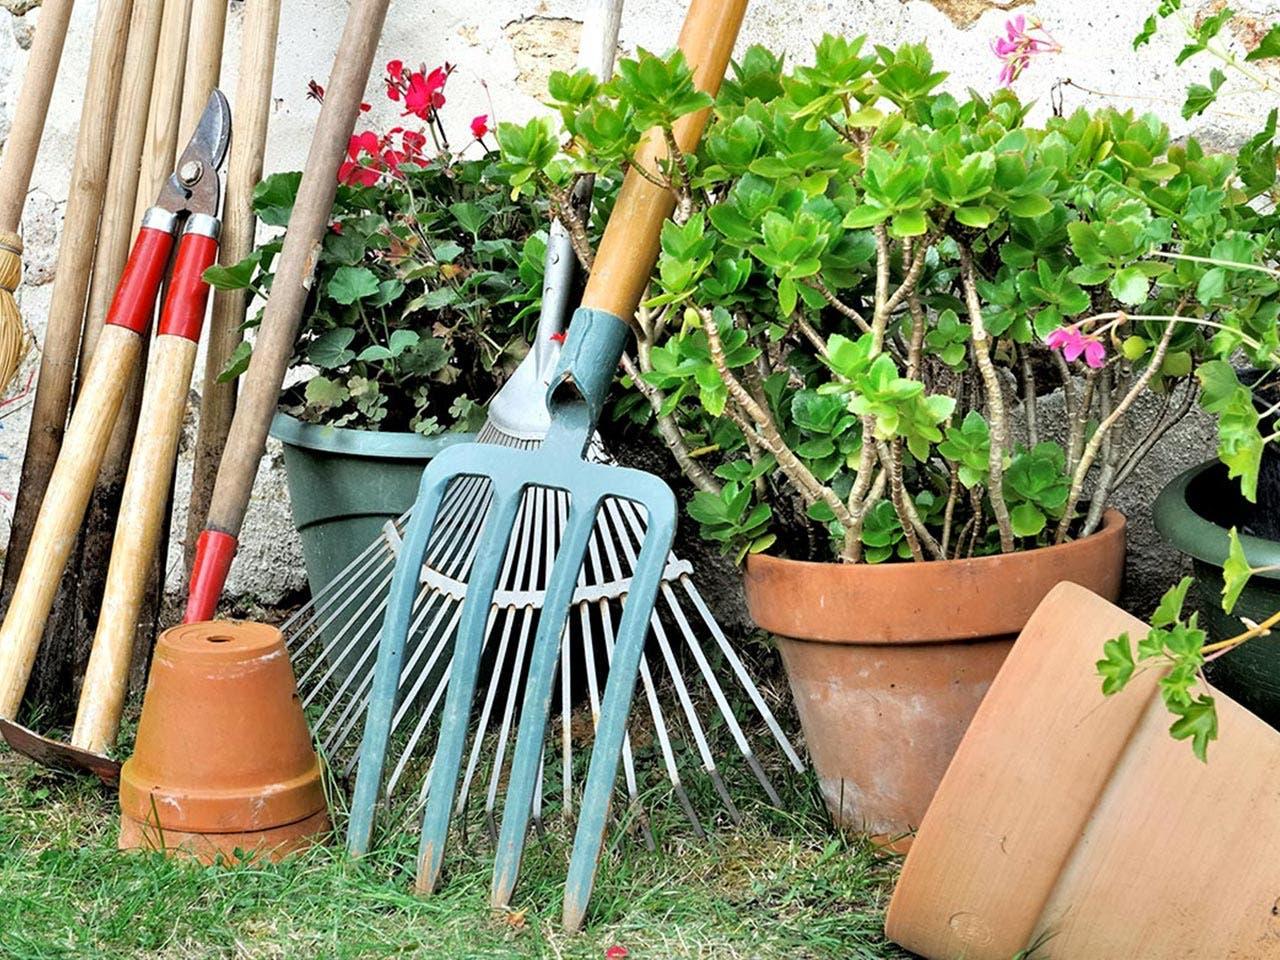 Things for the garden | sanddebeautheil/Shutterstock.com